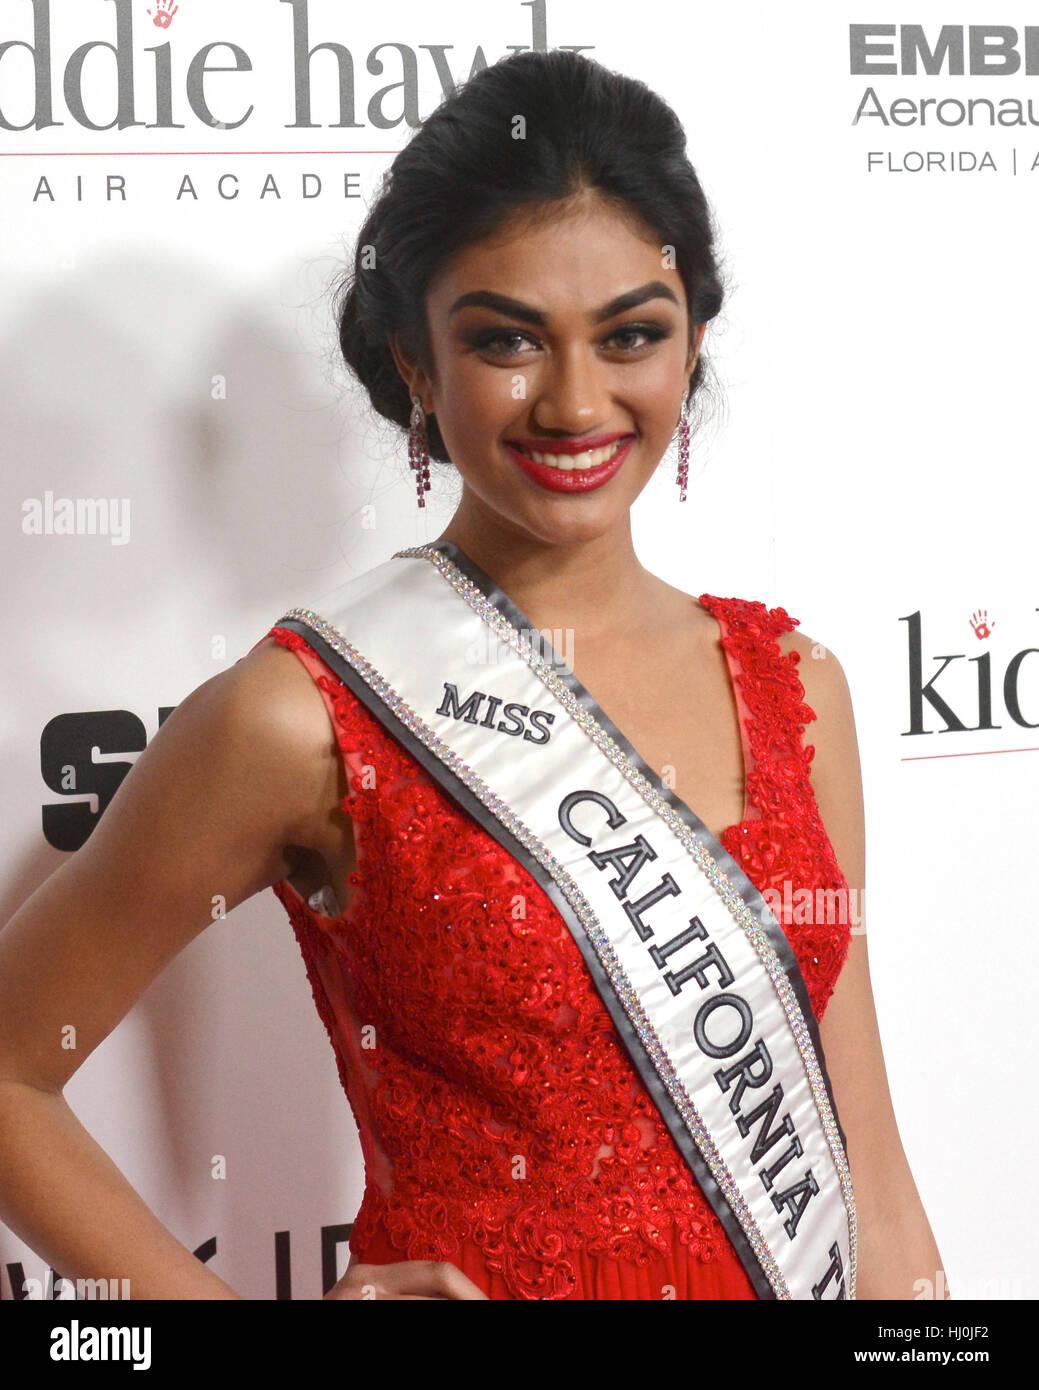 0854d74fc81 Miss Teen California Photos & Miss Teen California Images - Alamy